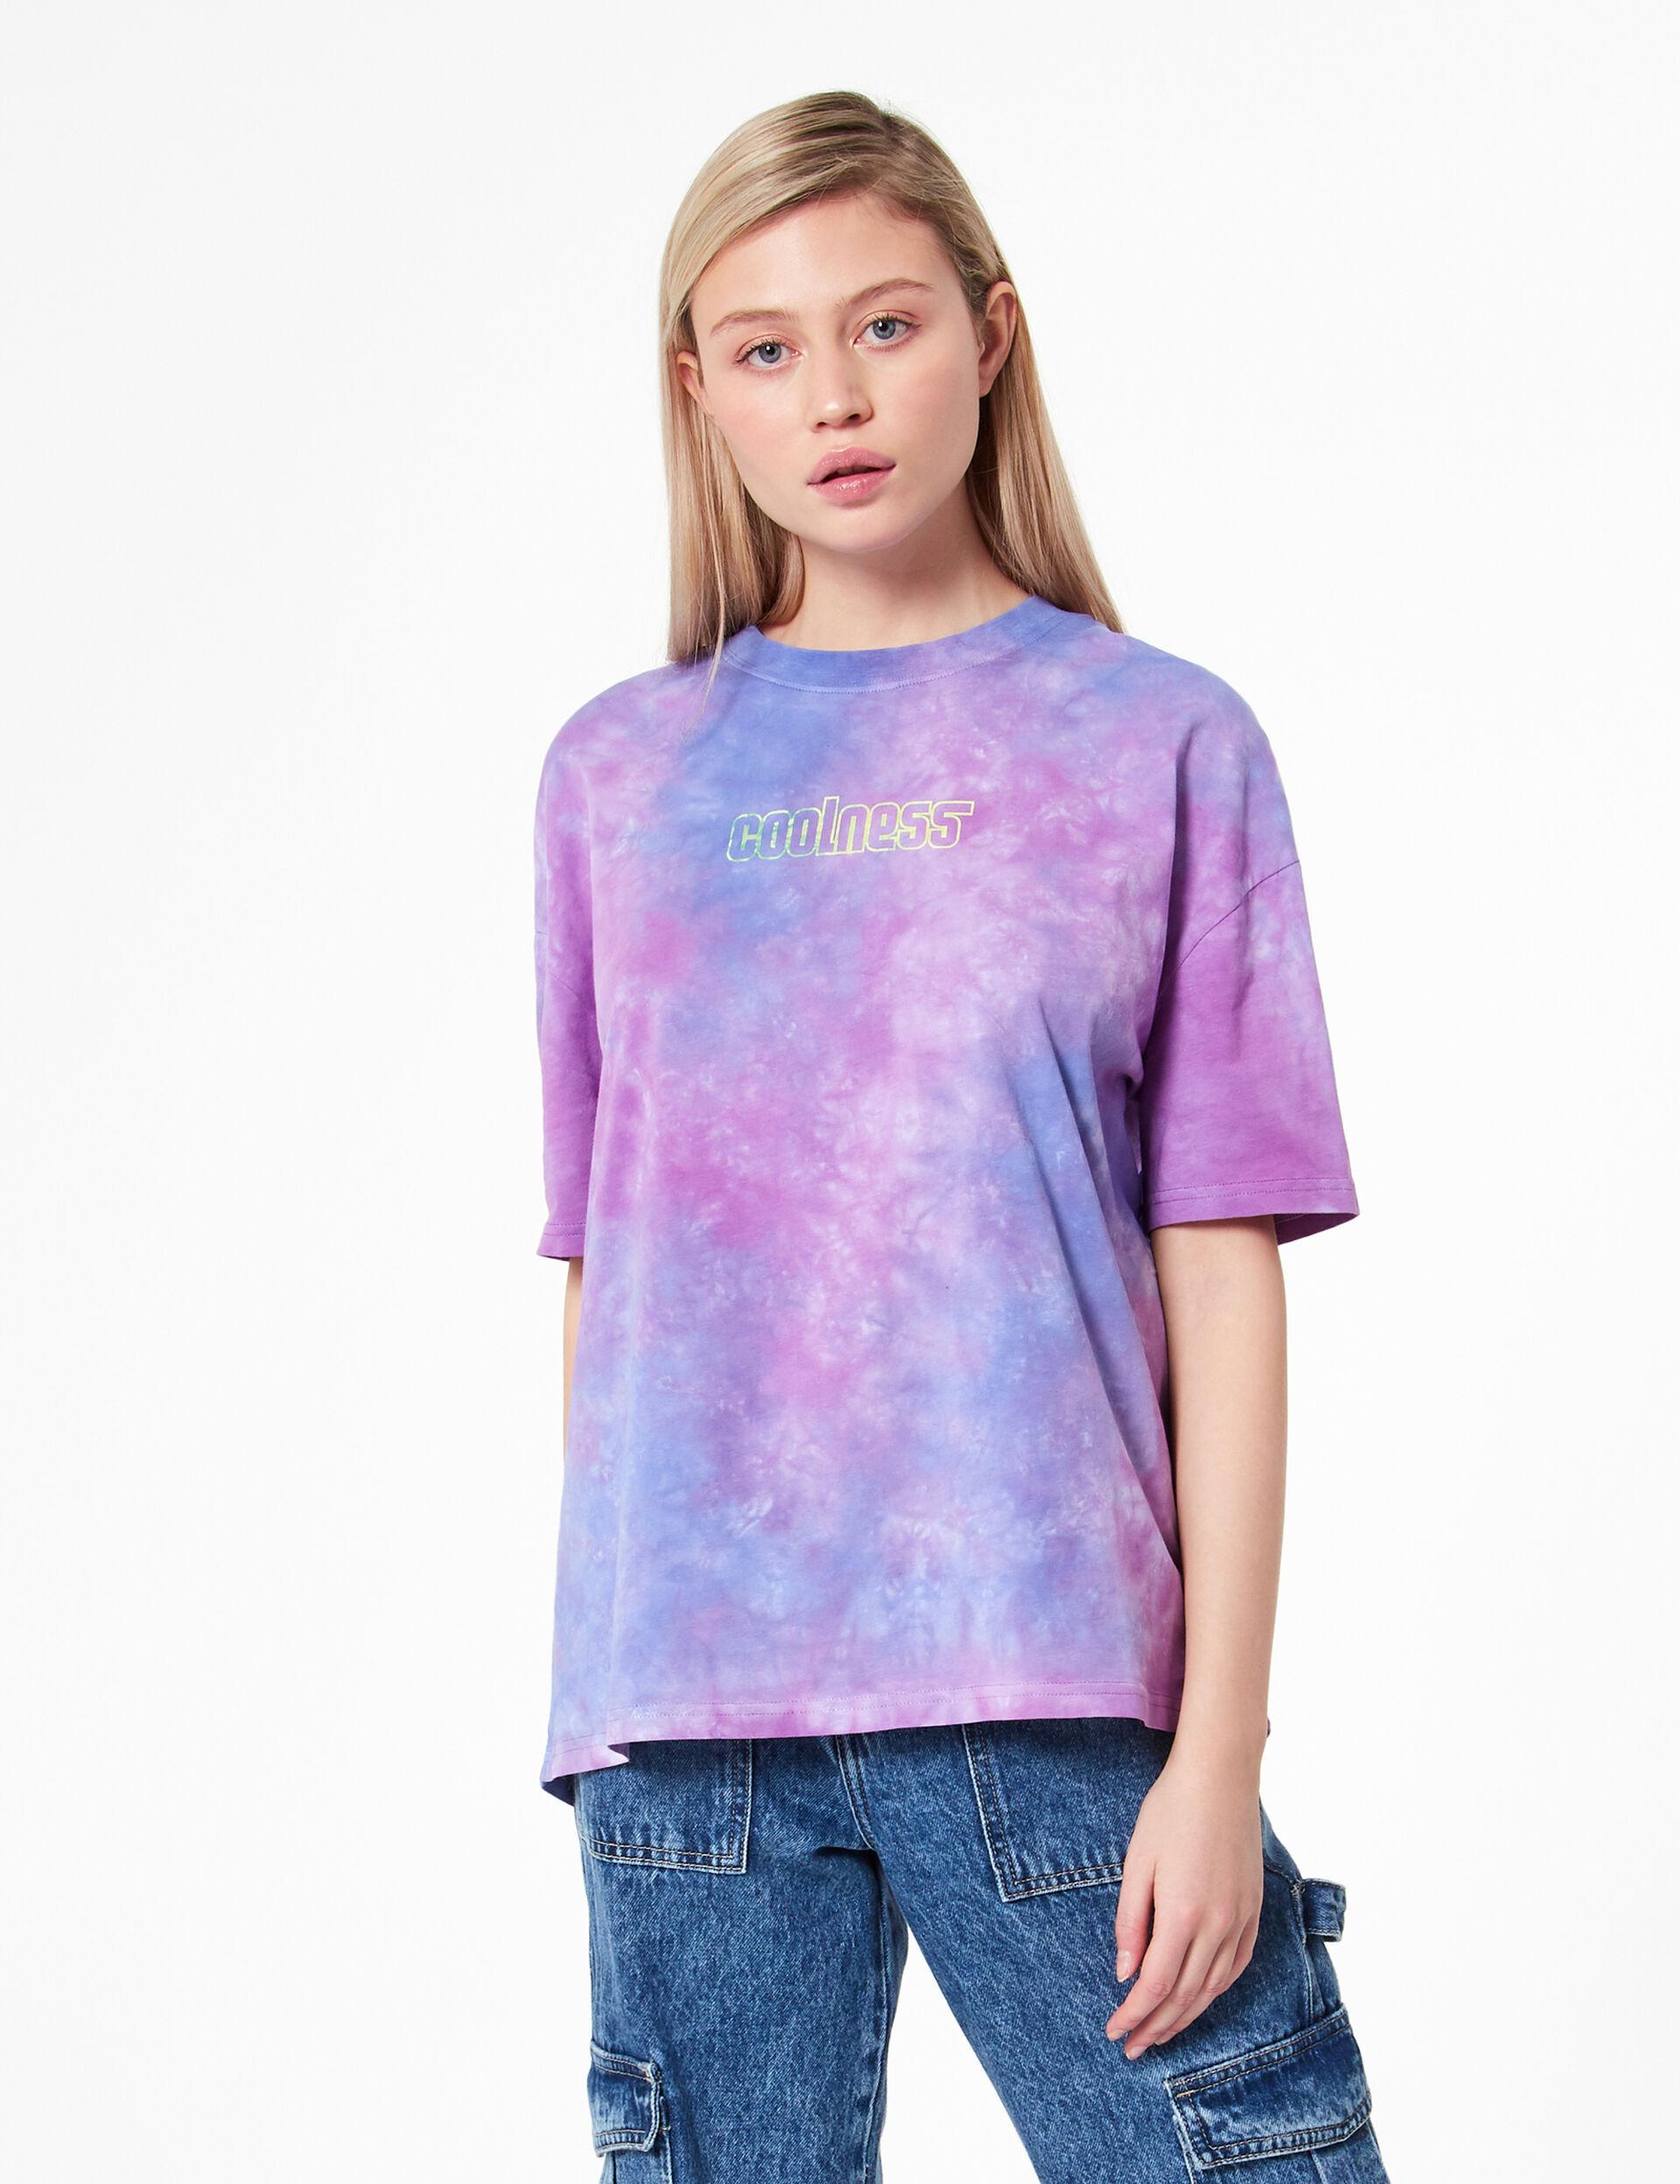 Tee-shirt coolness